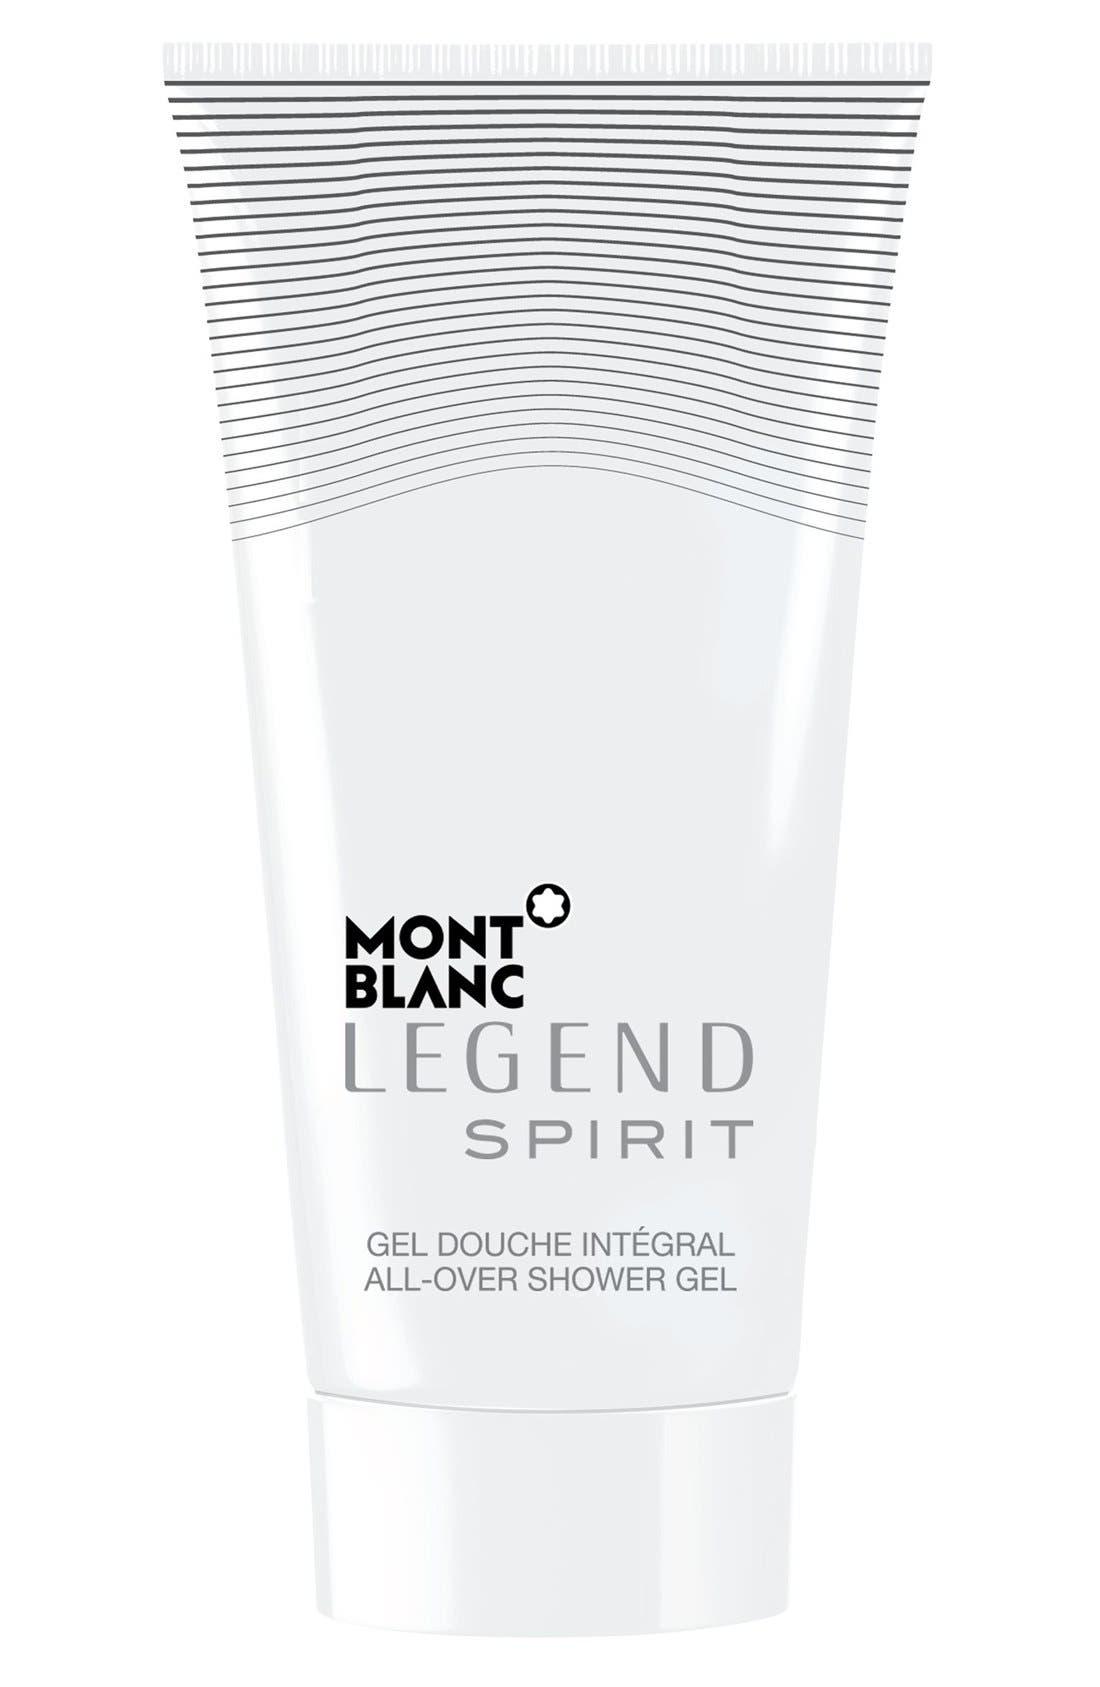 'Legend Spirit' All-Over Shower Gel,                             Main thumbnail 1, color,                             000